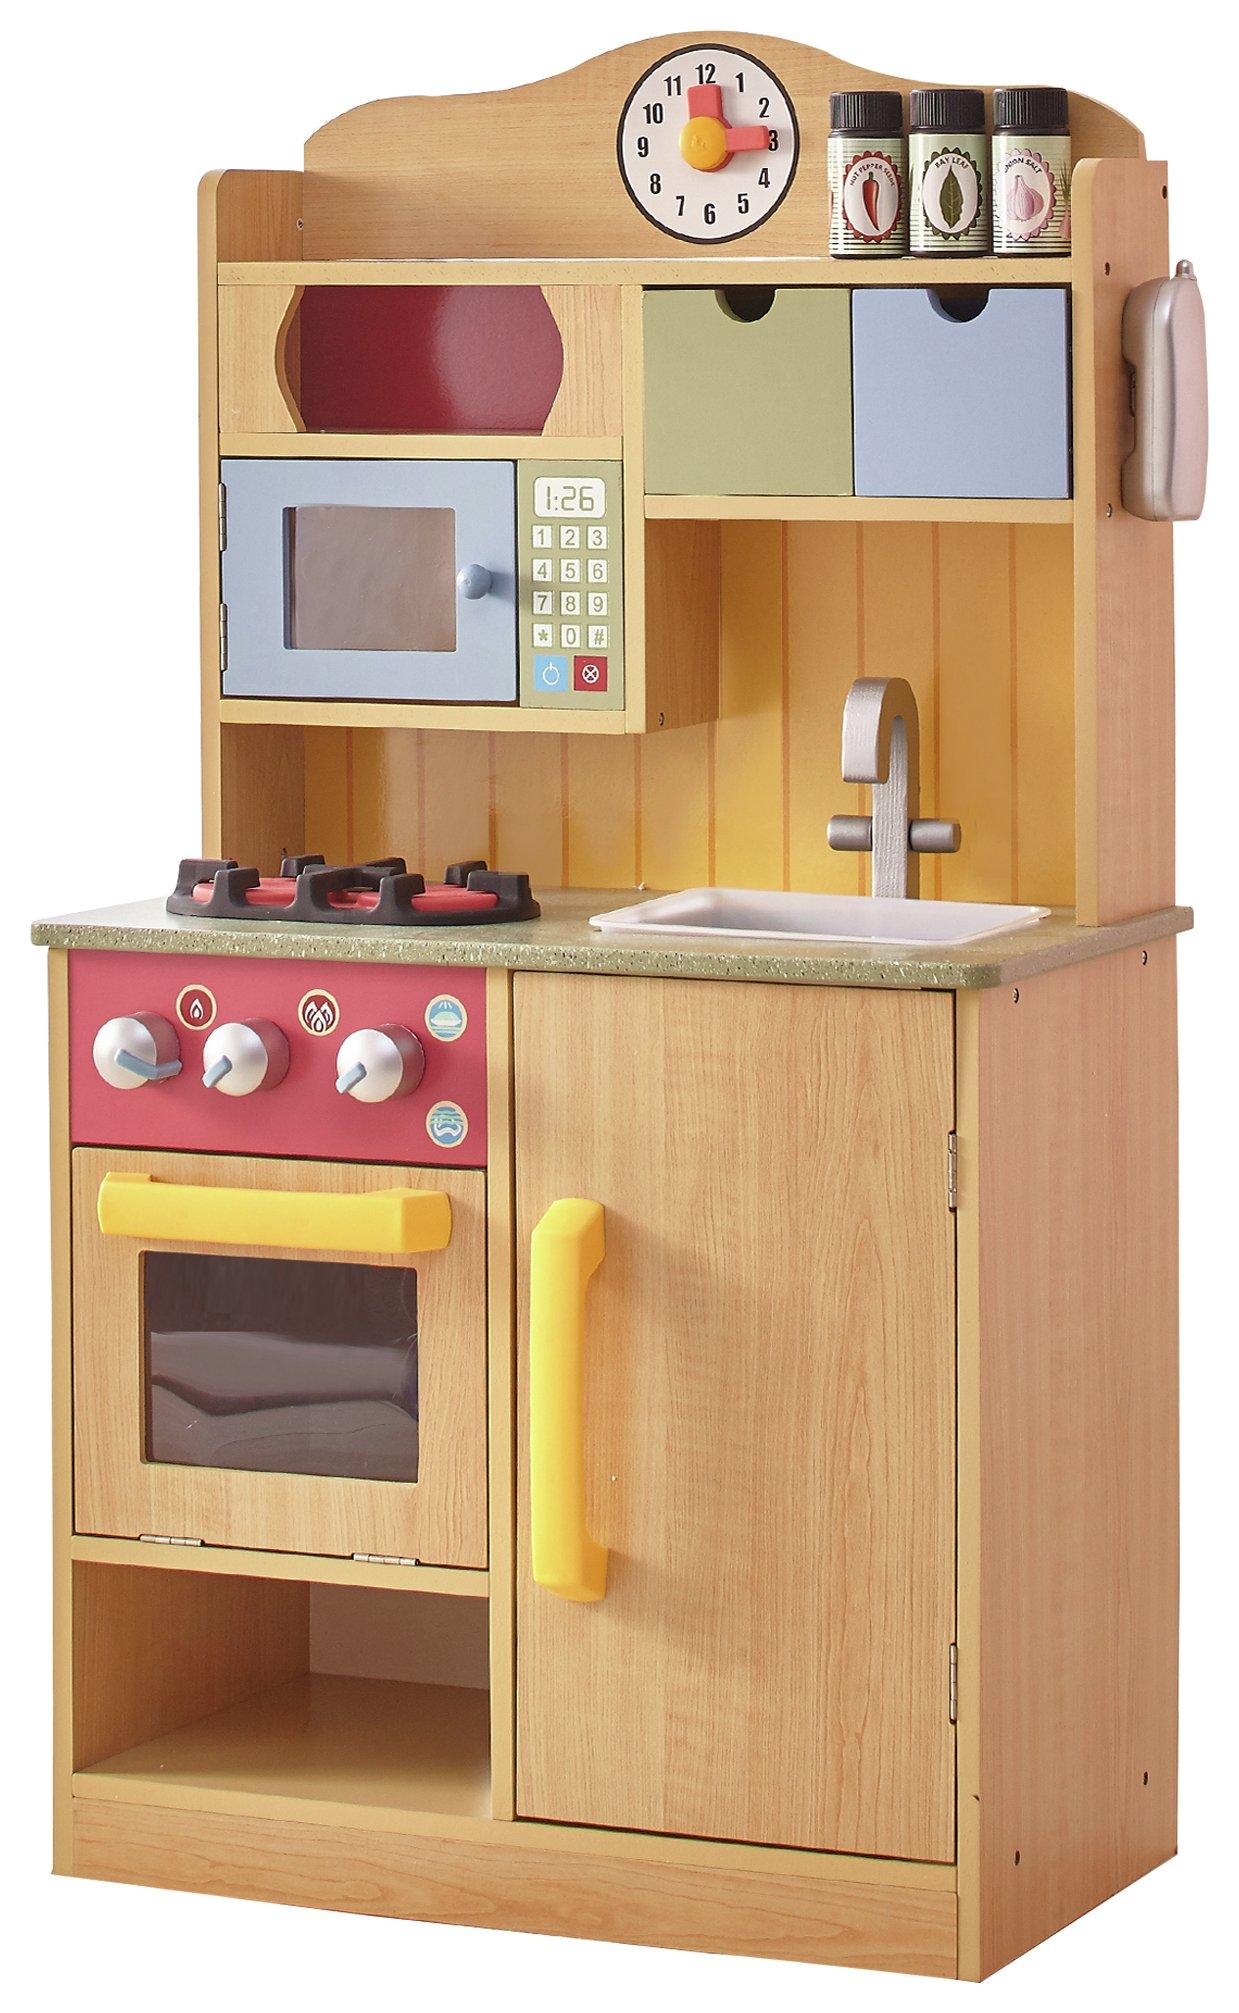 Swell Teamson Kids Wooden Little Chef Play Kitchen Download Free Architecture Designs Viewormadebymaigaardcom